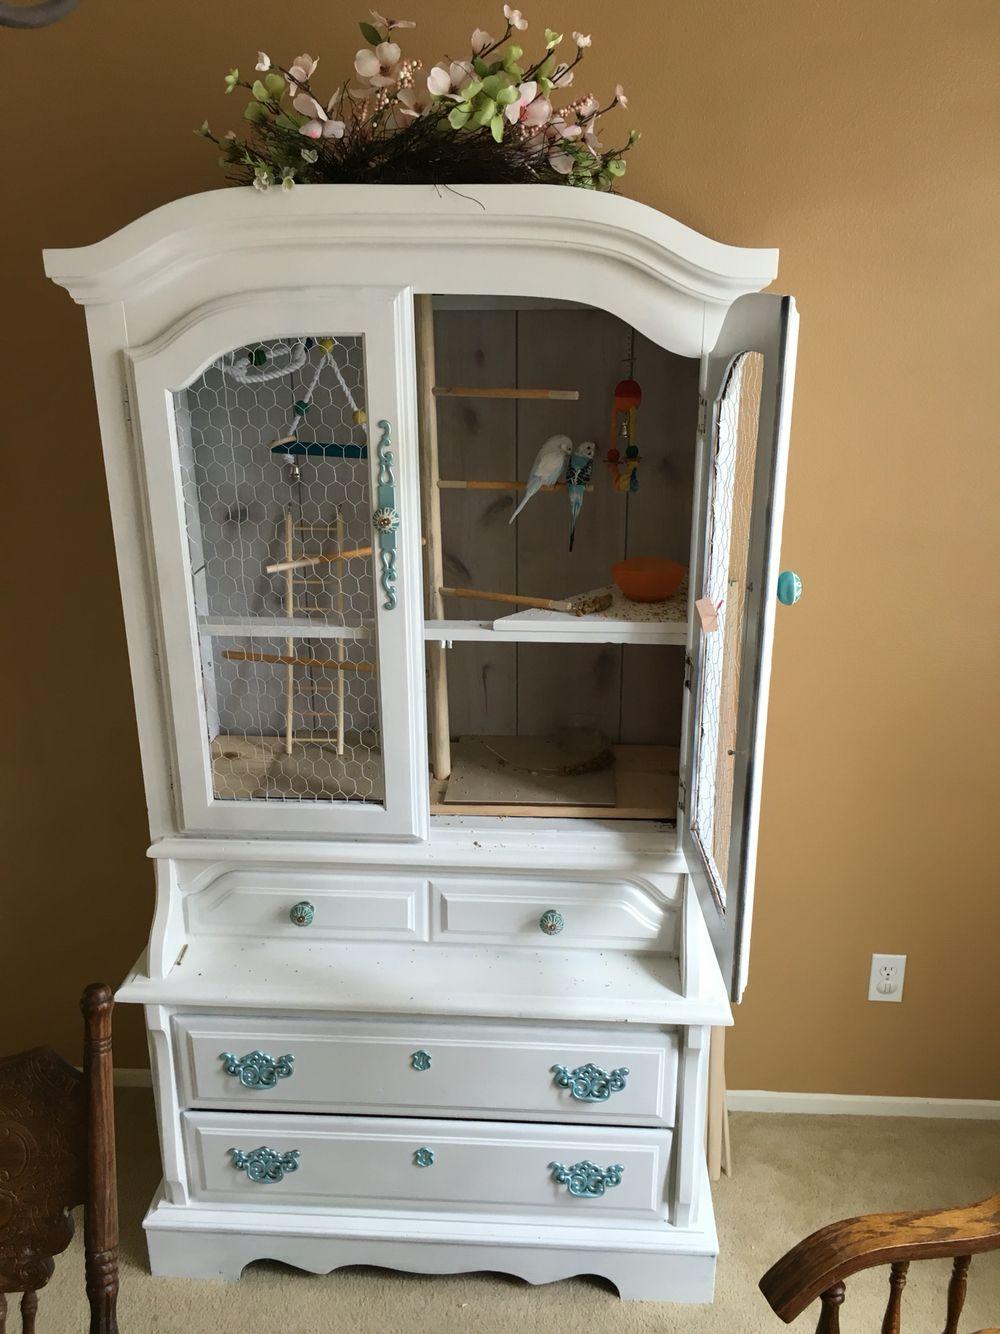 betta fish tank setup ideas that make a statement diy. Black Bedroom Furniture Sets. Home Design Ideas